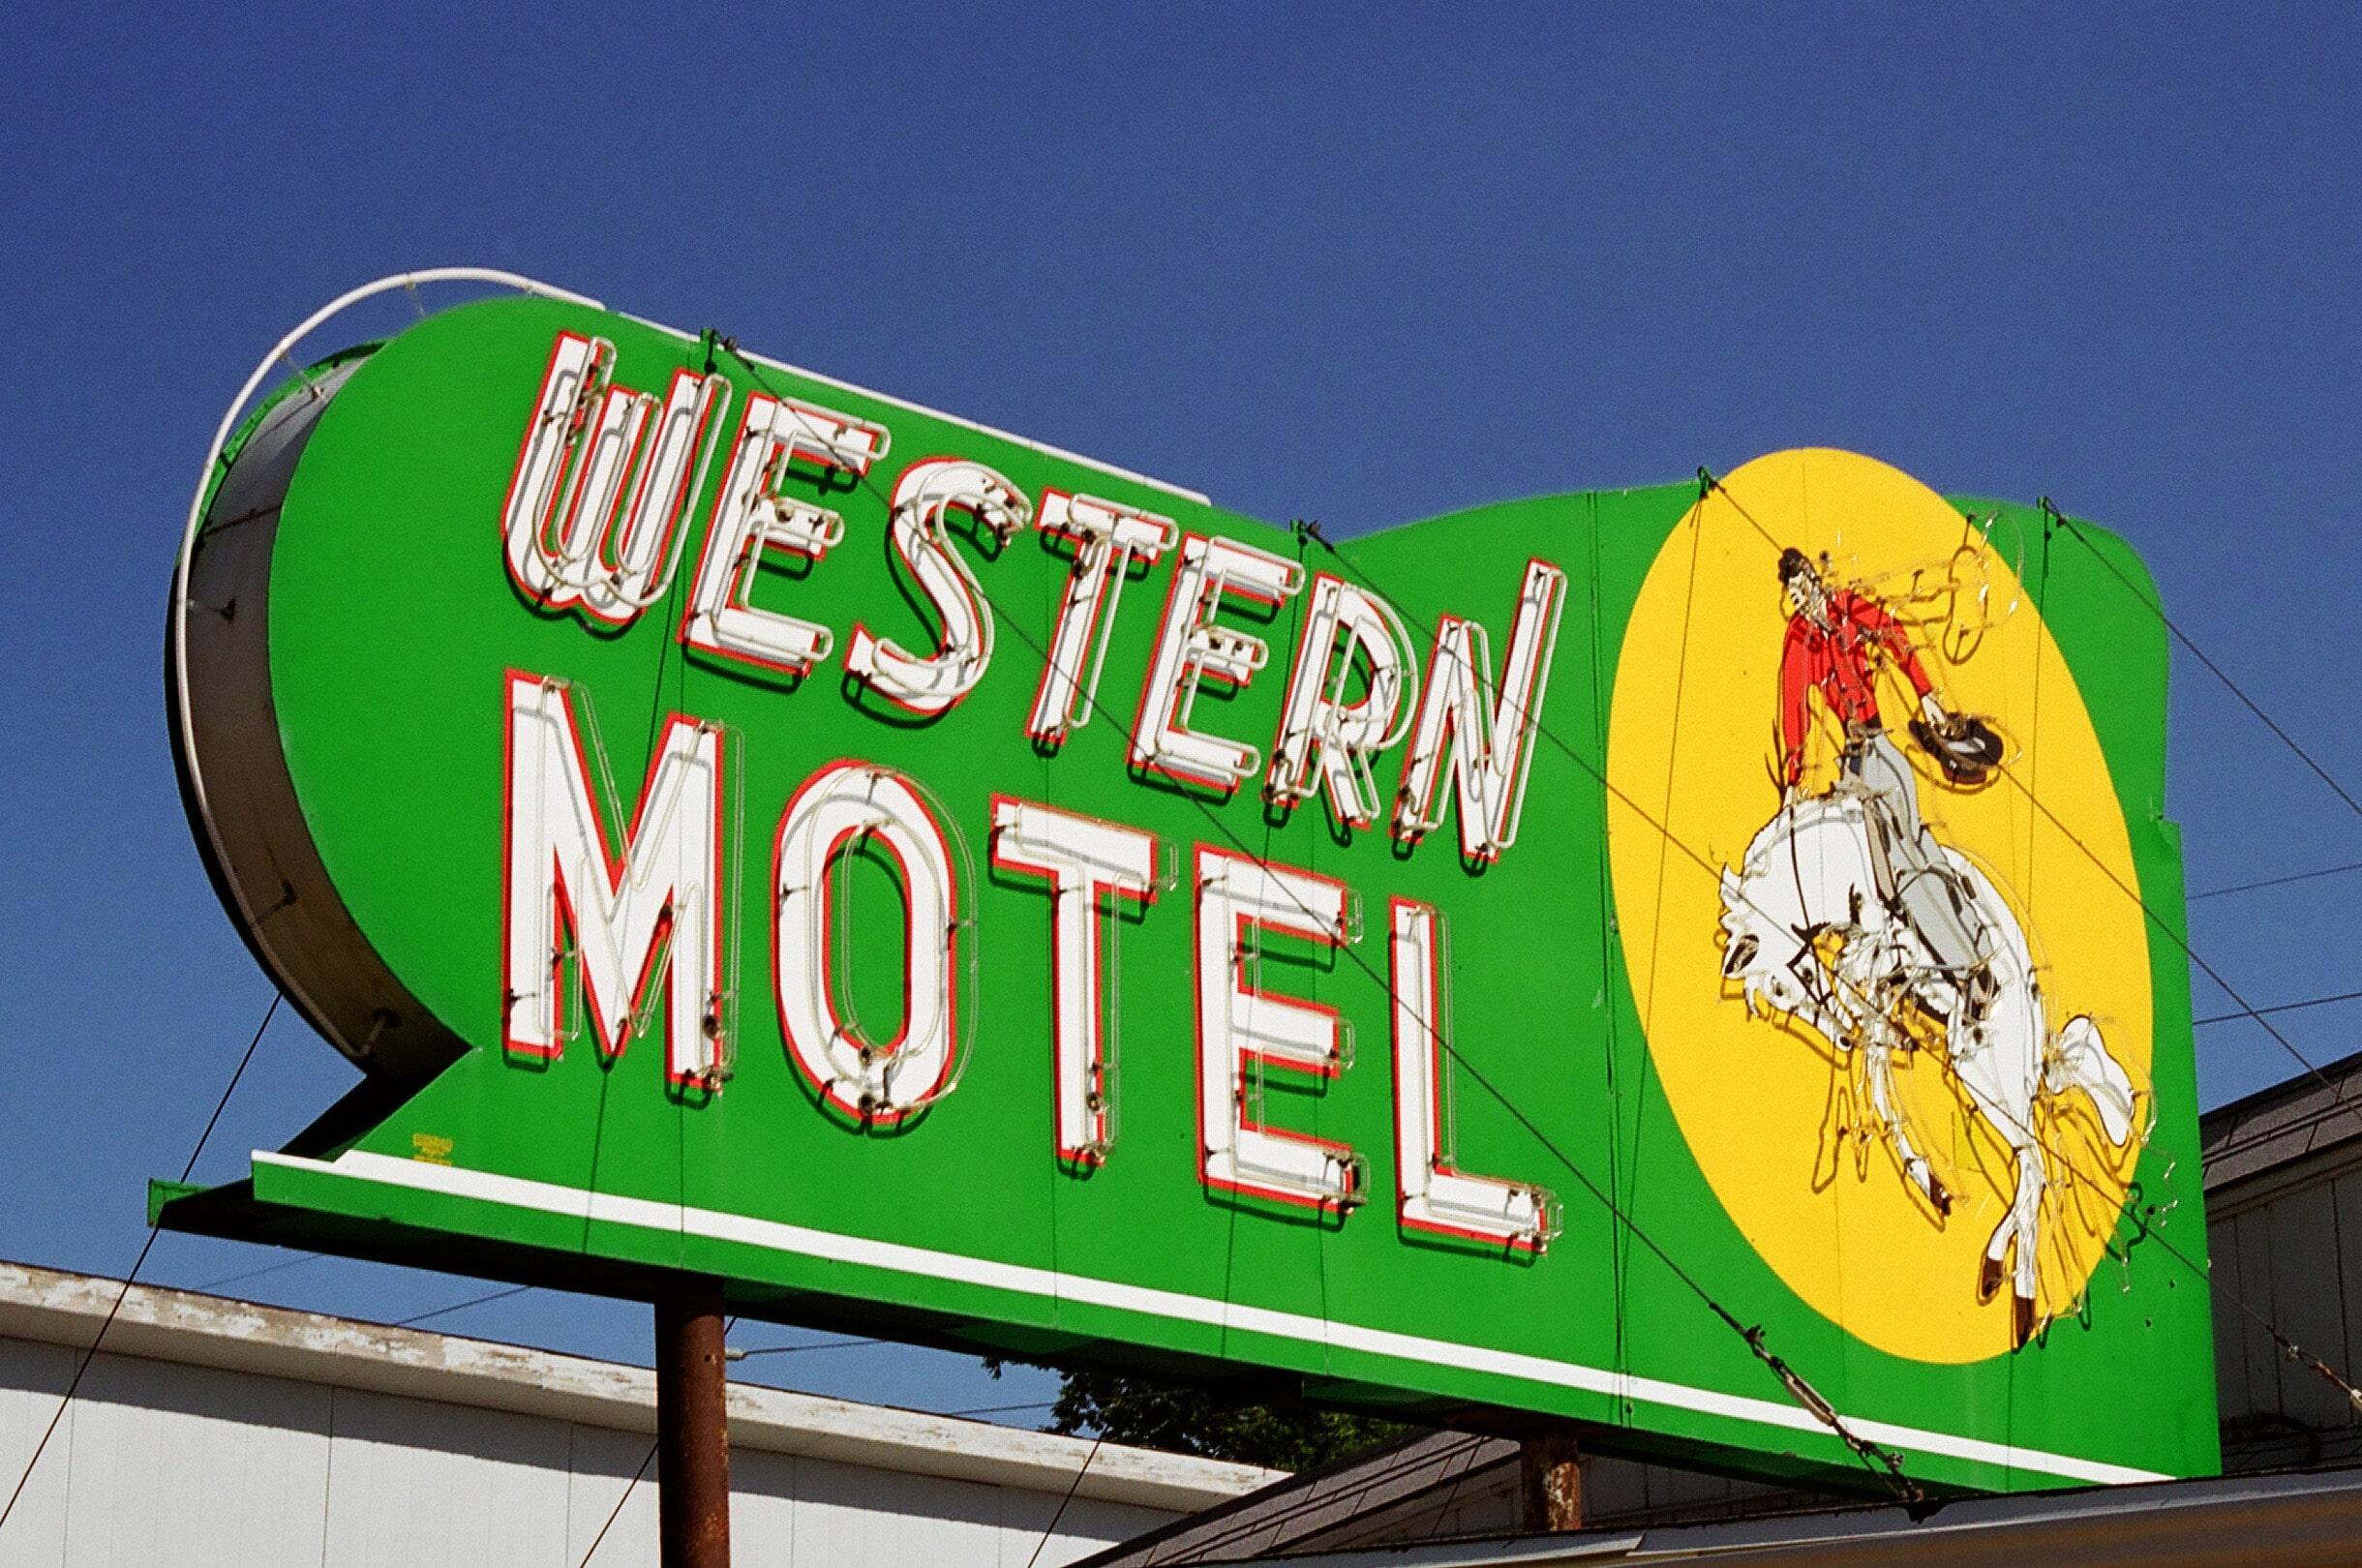 04 Western Motel